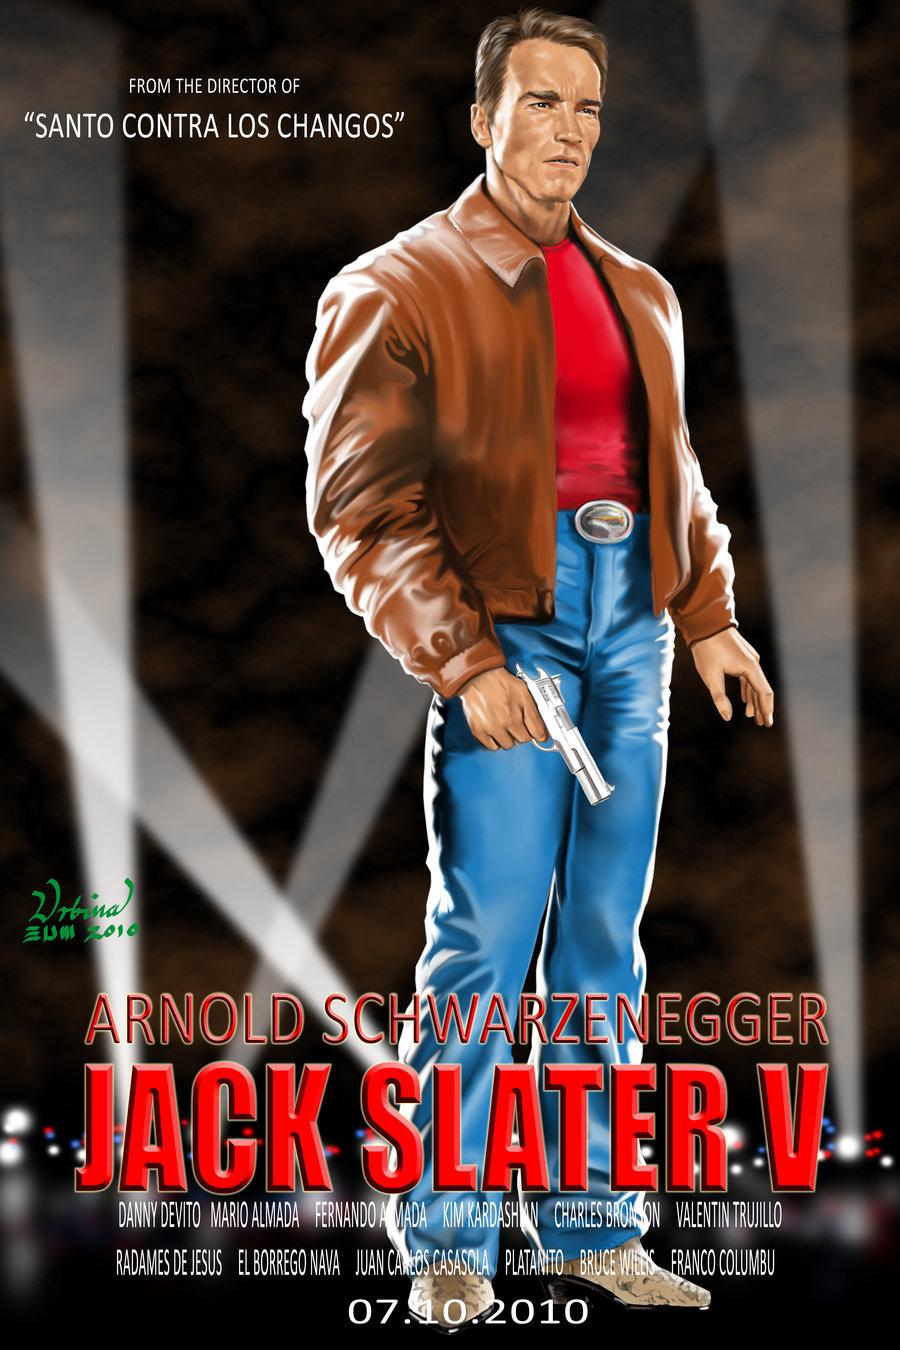 Arnold Schwarzenegger Starring In Jack Slater V, Movie Poster By ...    Valentin